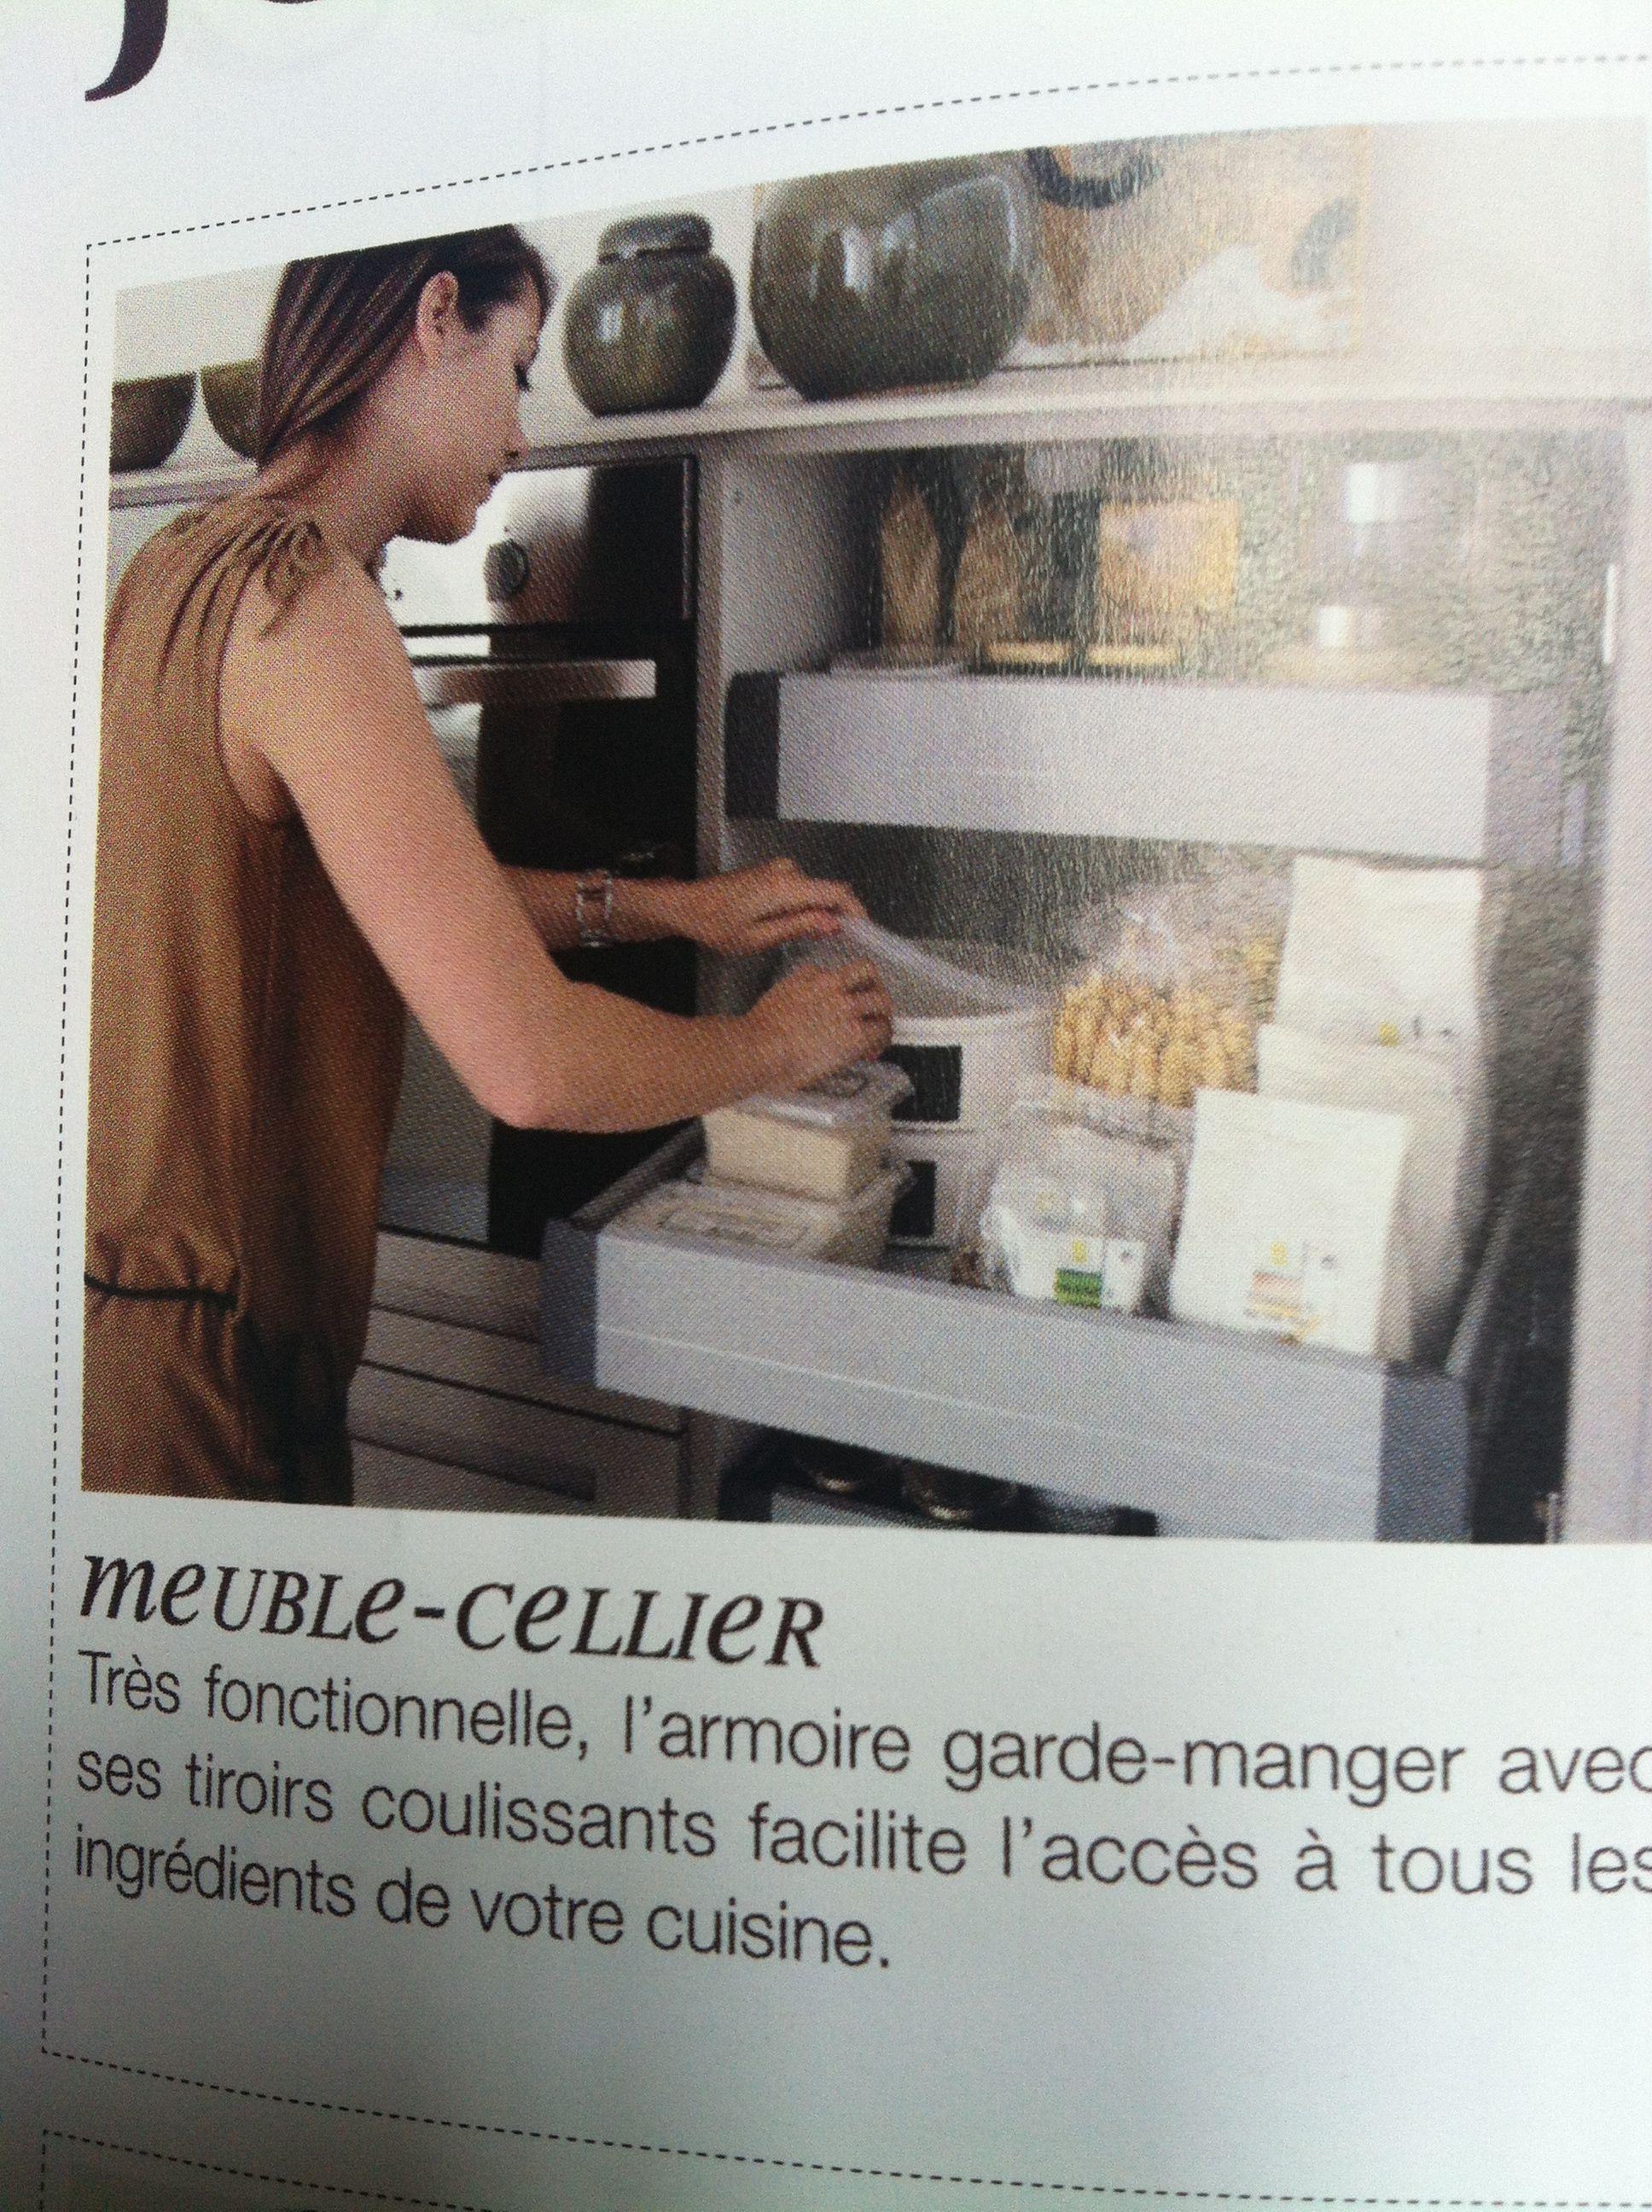 Tiroir Cellier Cuisinella Kitchen Kitchen Appliances Microwave